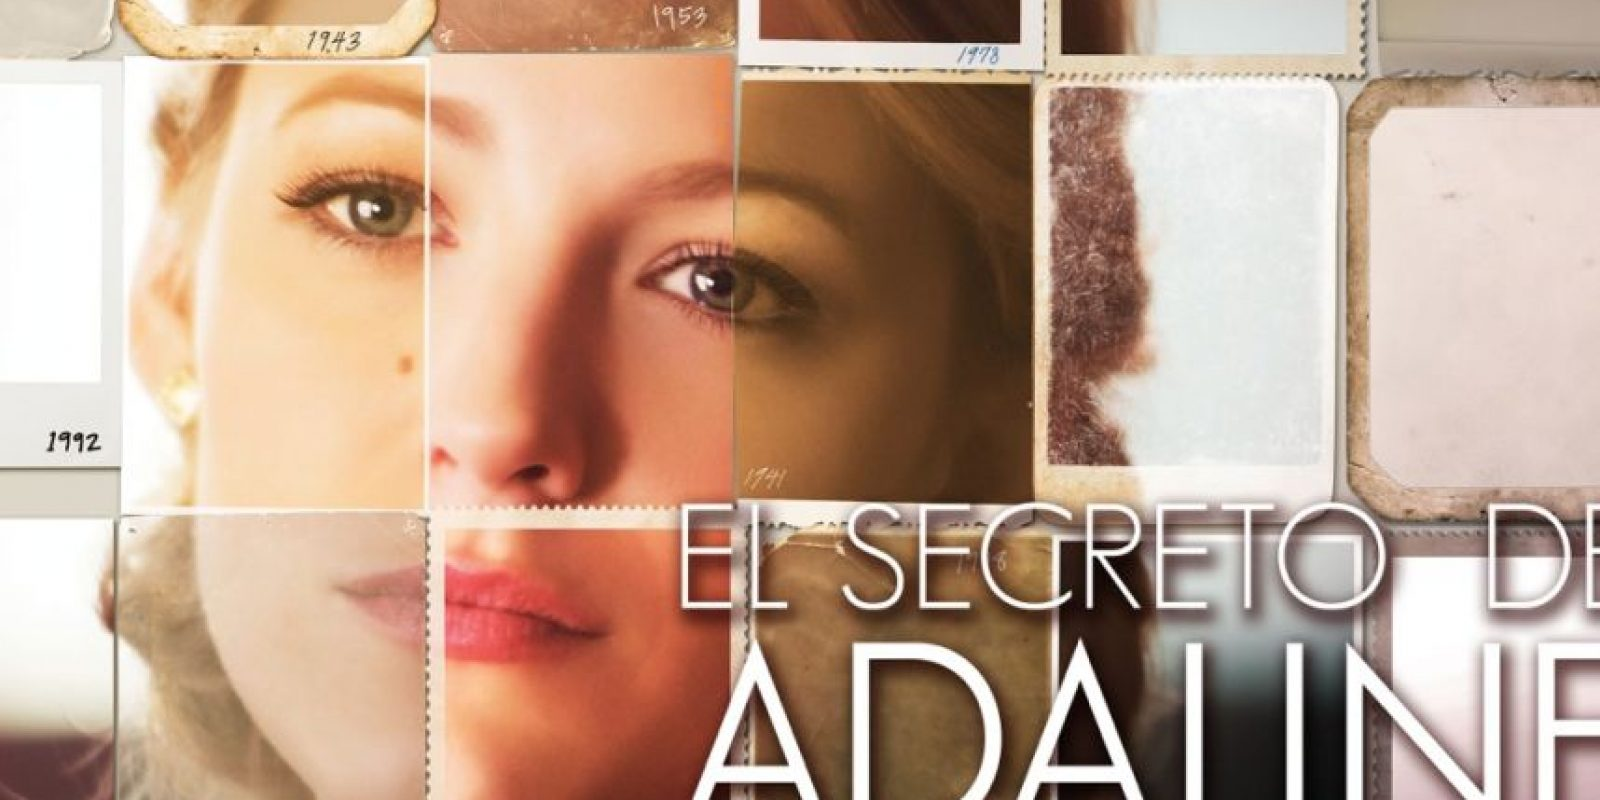 """El secreto de Adaline"". Disponible a partir del 8 de septiembre. Foto:Lions Gate Entertainment"